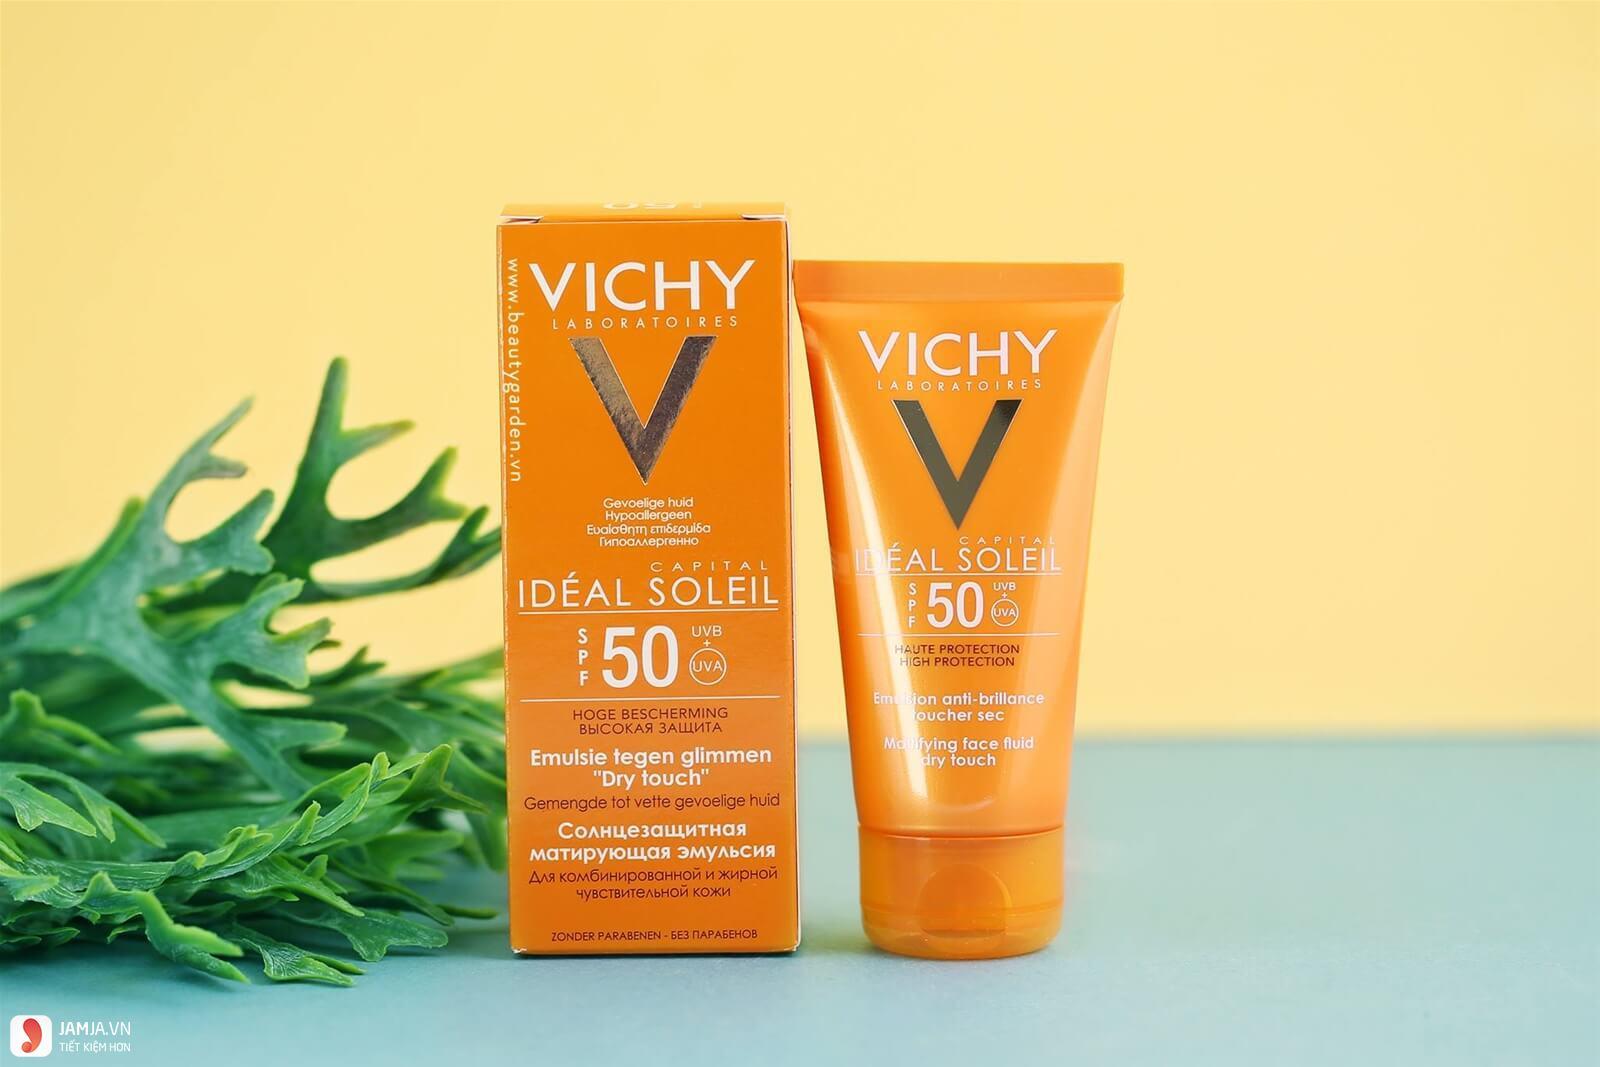 Kem chống nắng Vichy Capital Idéal Soleil Mattifying Dry Touch Face Fluid